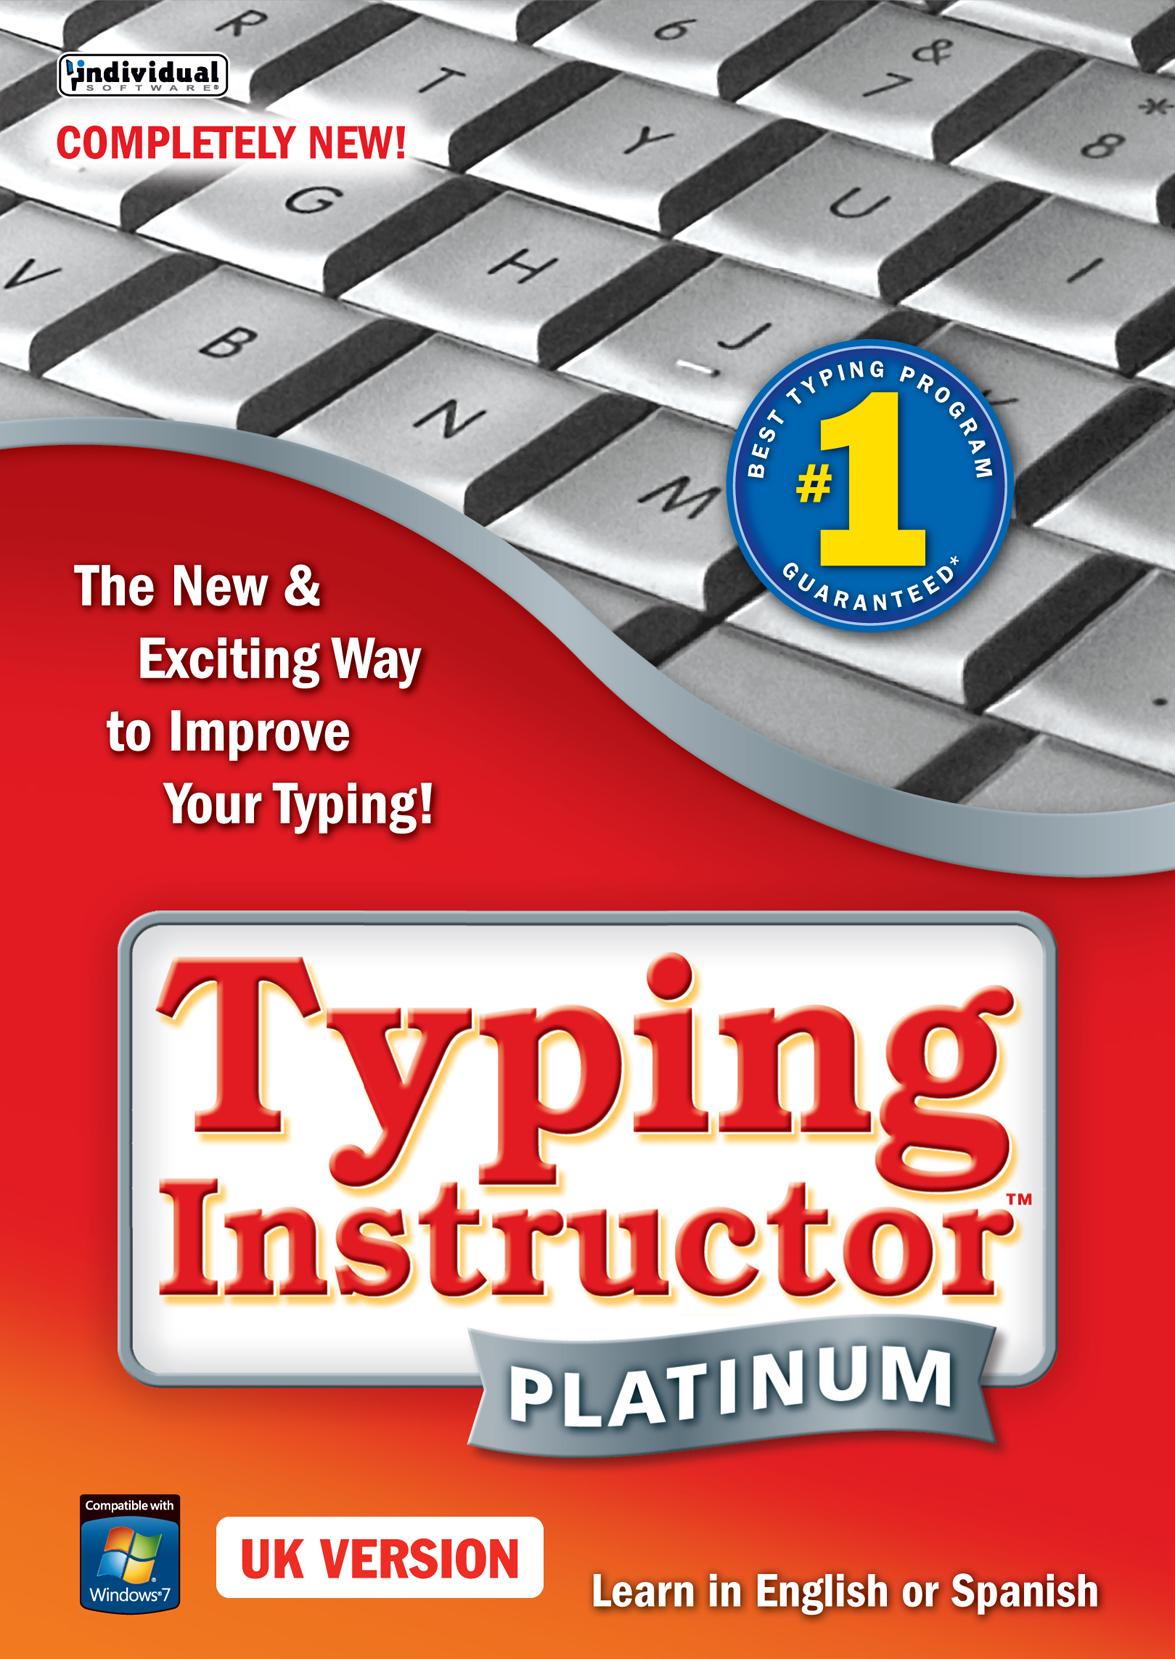 Typing Instructor Platinum 21 – Full UK English Version [Download] Test